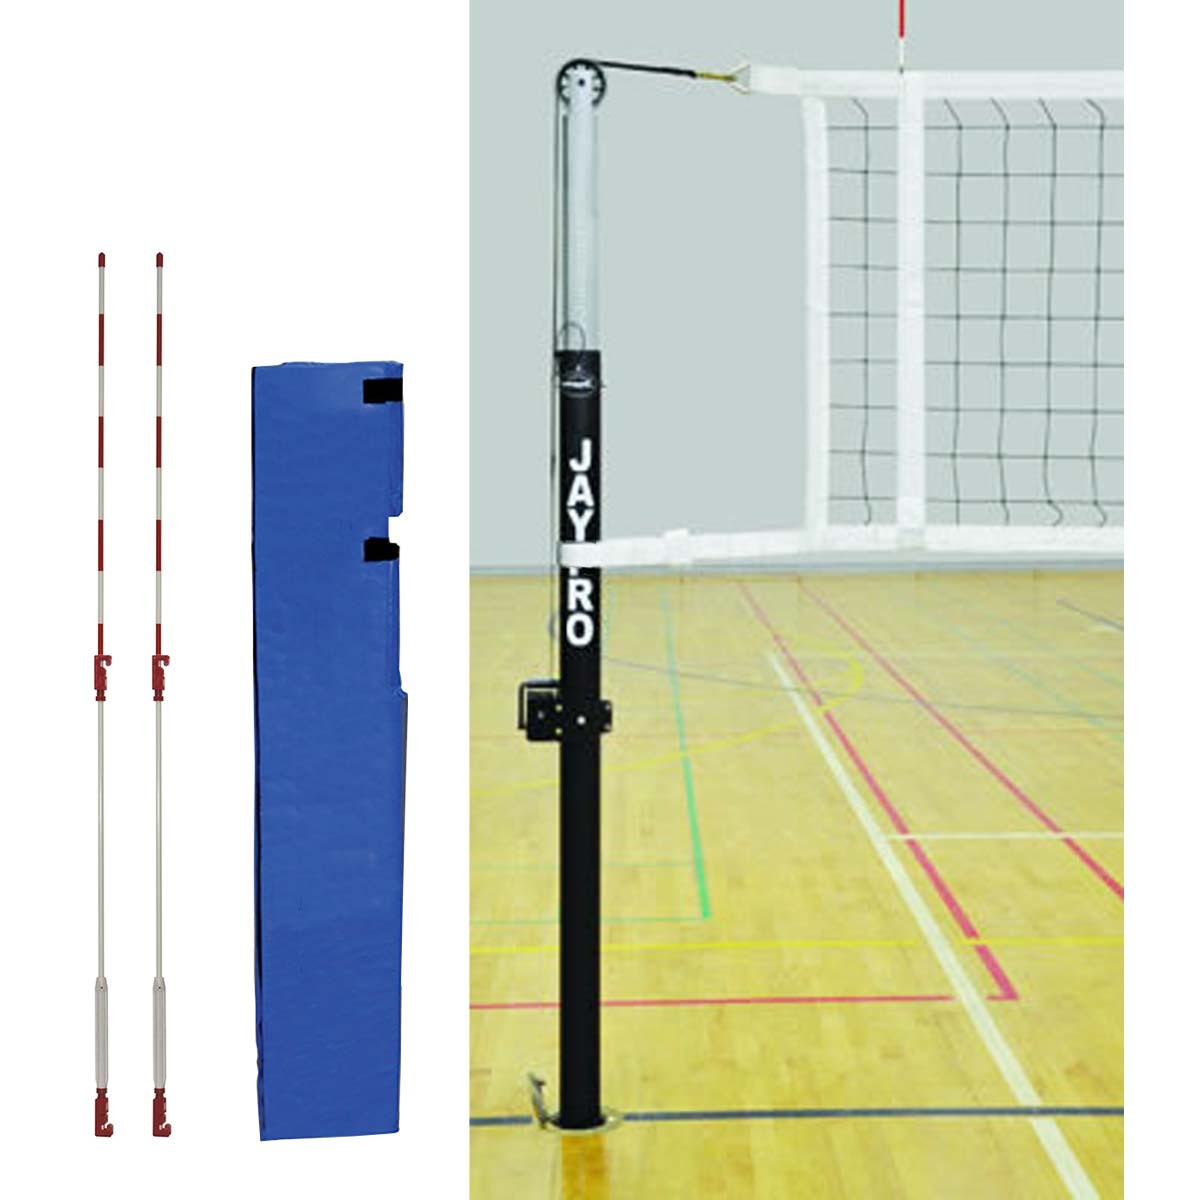 Jaypro PVB-5000 Featherlite Volleyball Net System